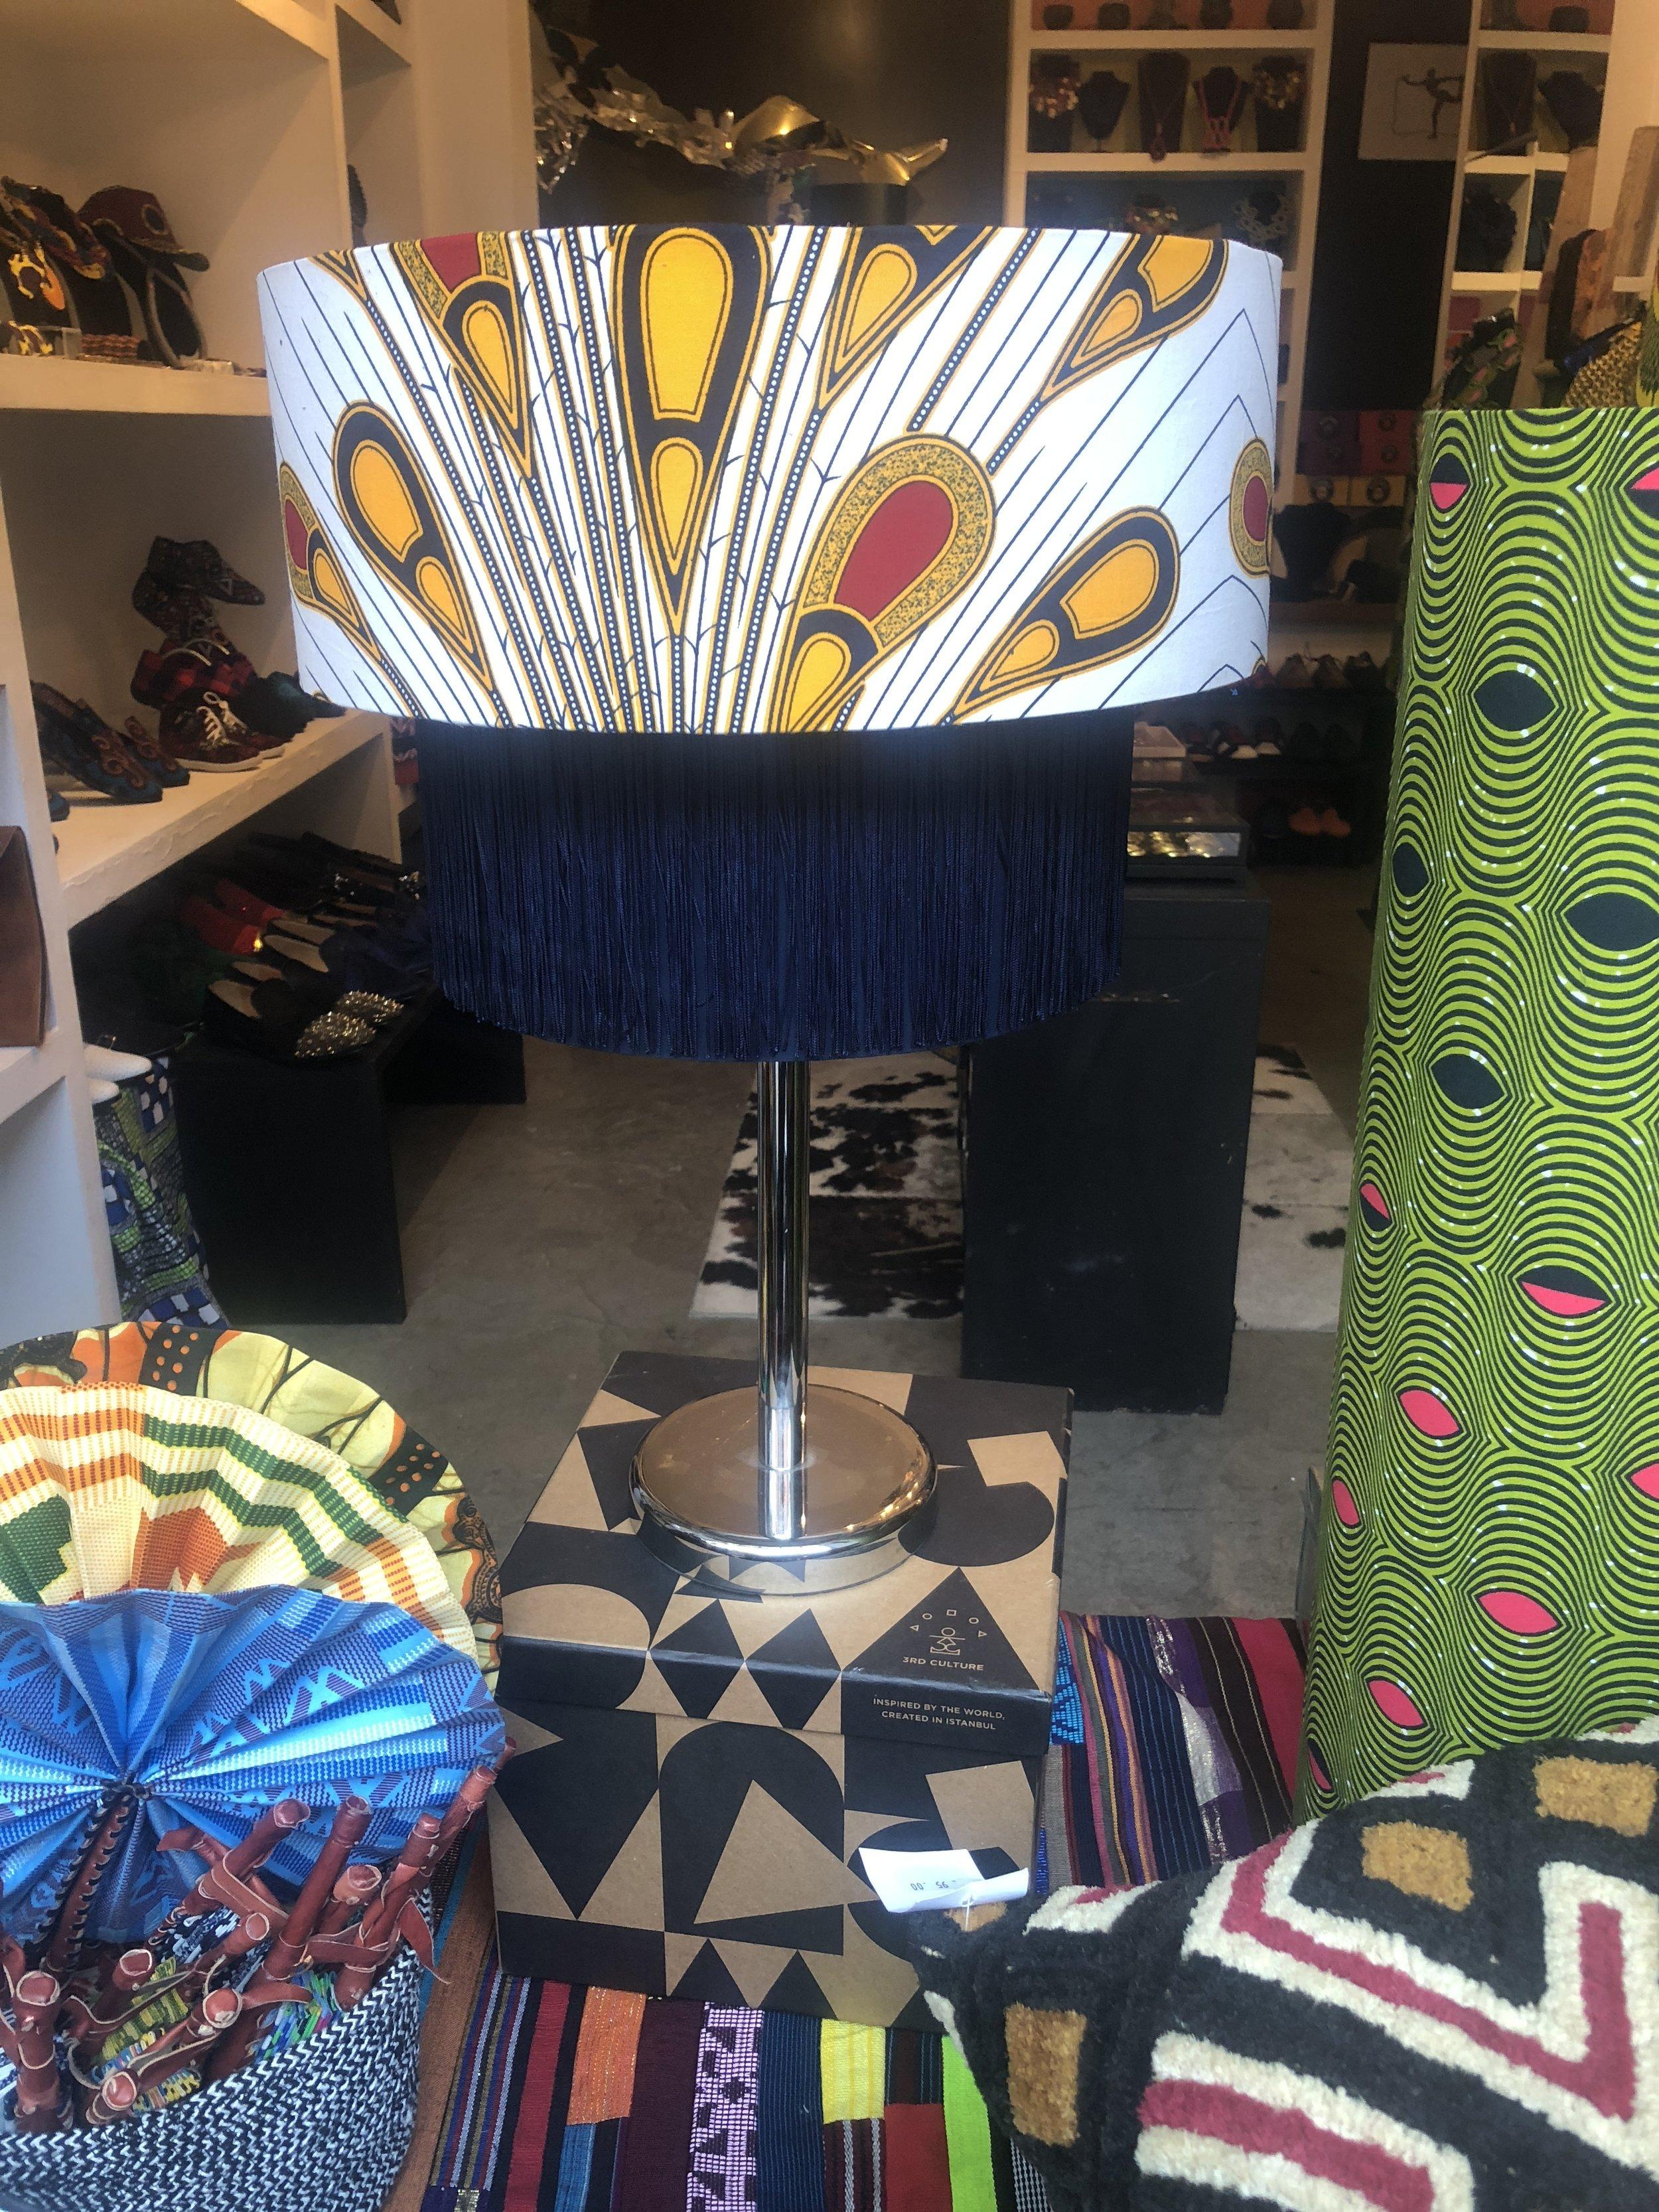 Bri lampshades in Soboye window display